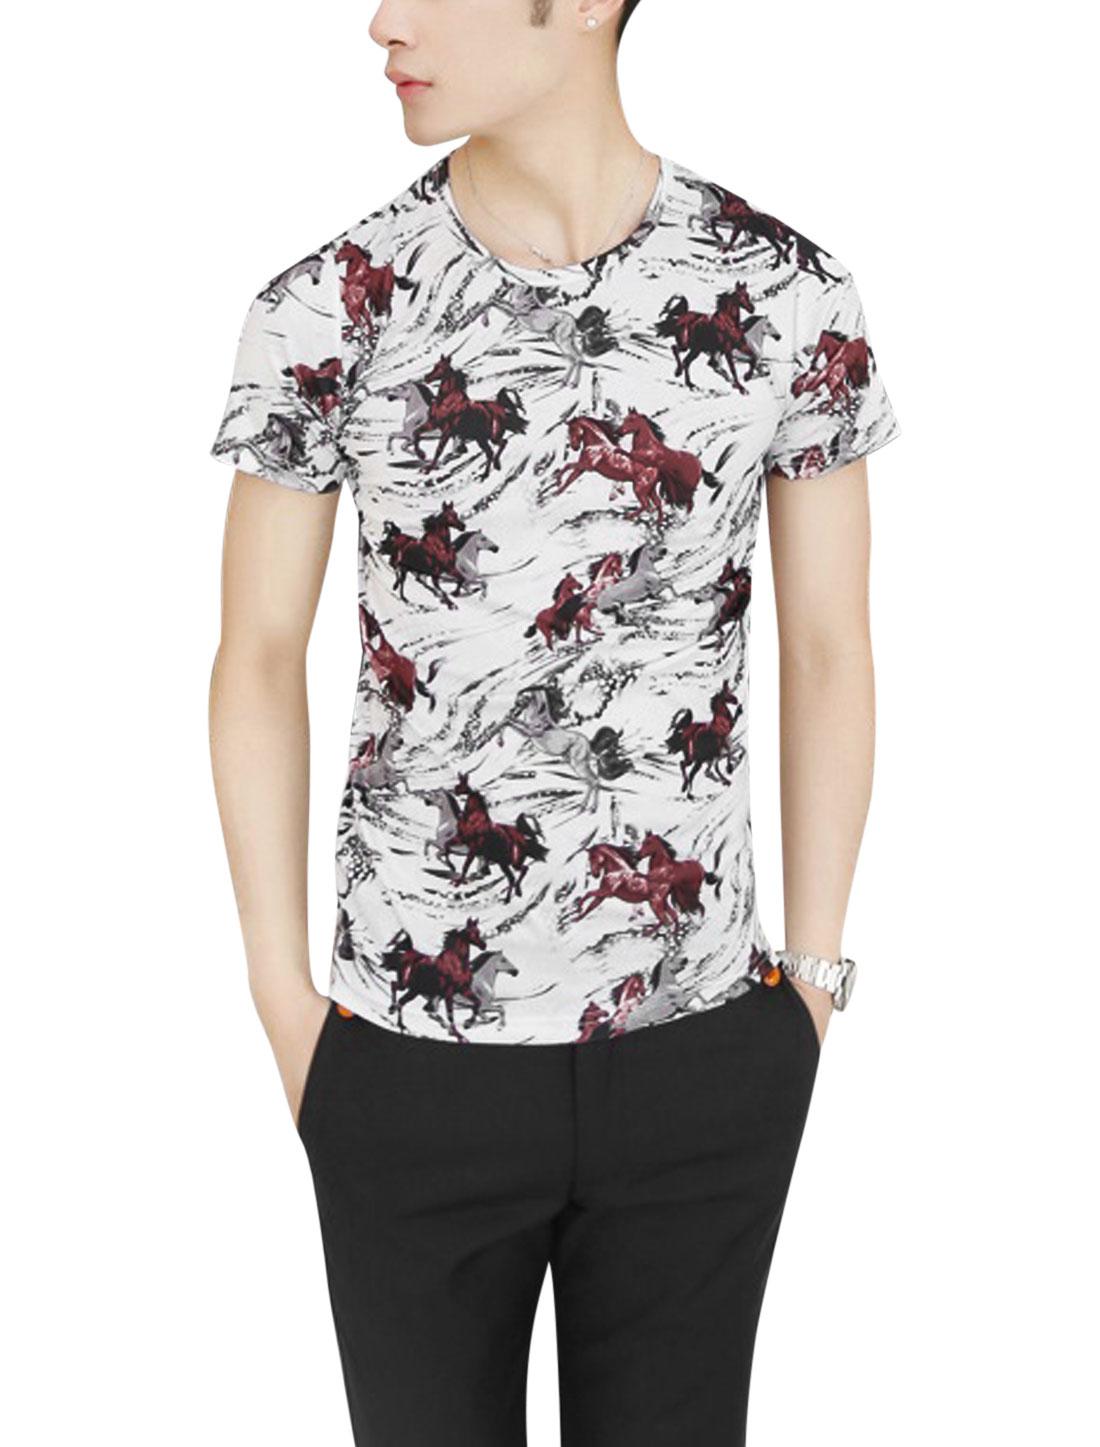 Men Round Neck Short Sleeve Horse Prints T-Shirt Gray Burgundy S